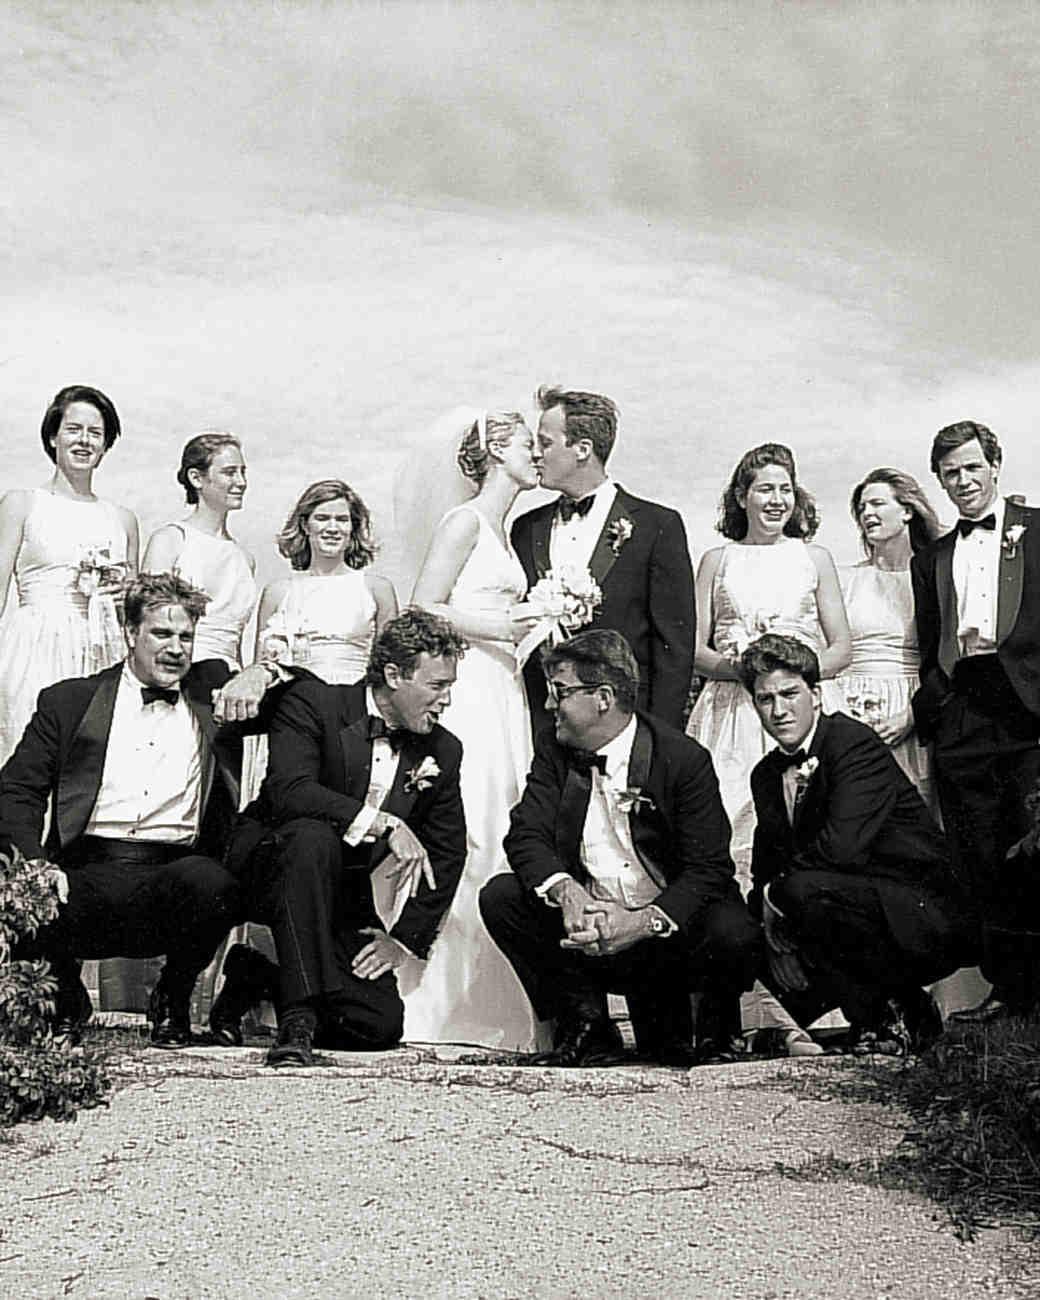 john-dolan-wedding-photographer-spring-1999-2-0914.jpg